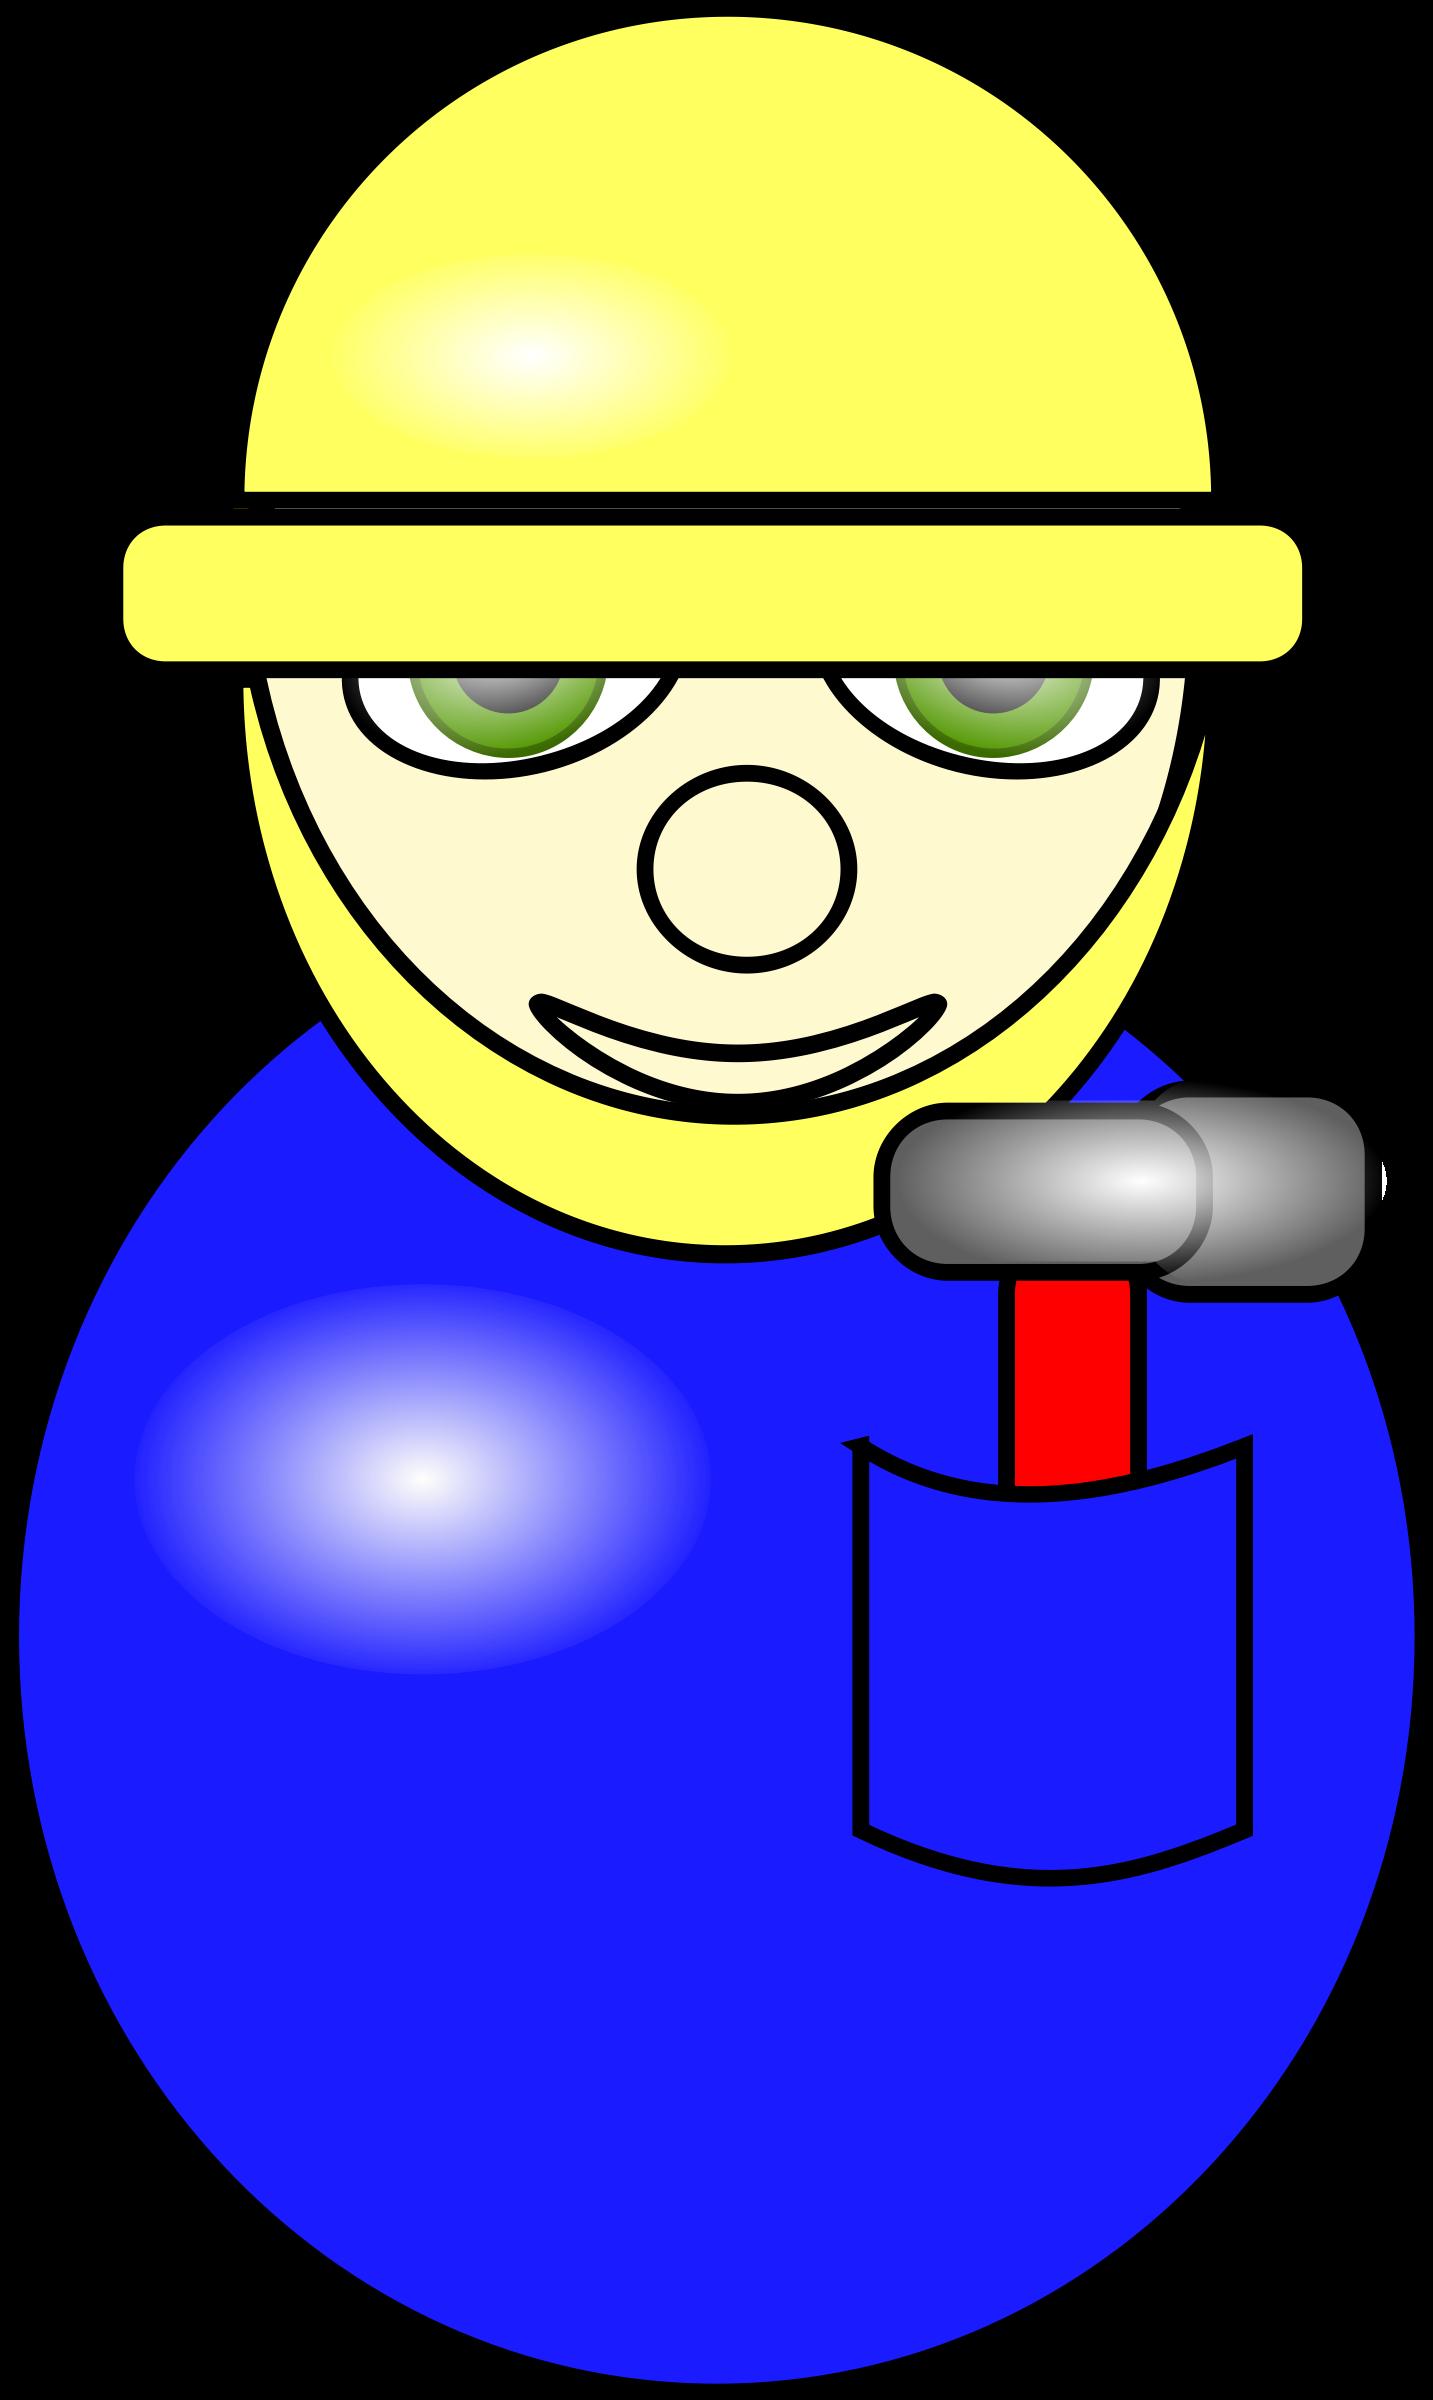 Village people construction worker. Hammer clipart hard hat